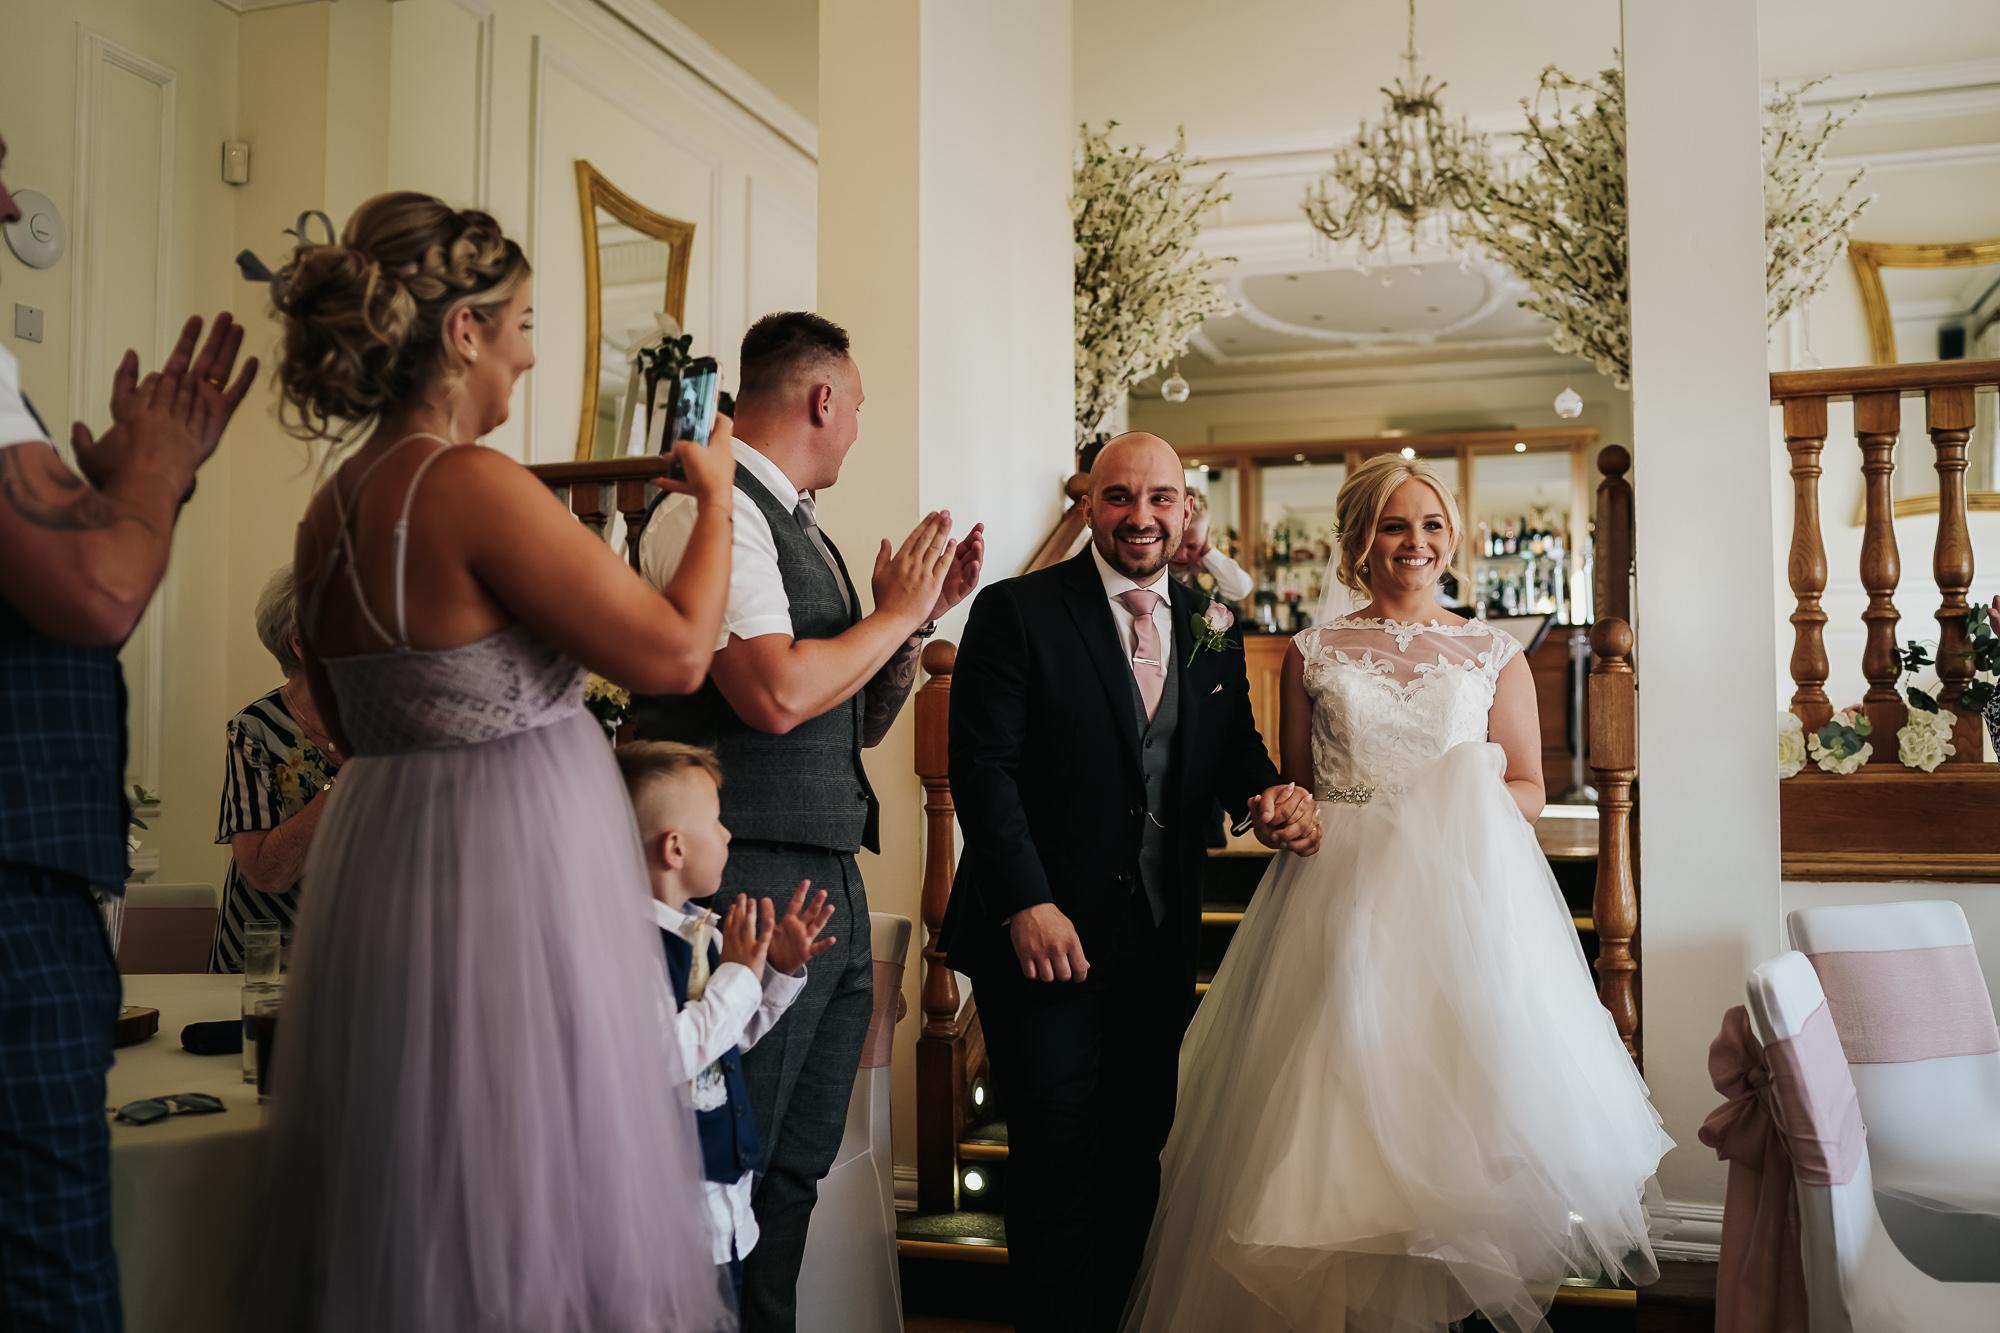 West Tower Wedding Photographer Ormskirk Lancashire wedding photography (39 of 57).jpg